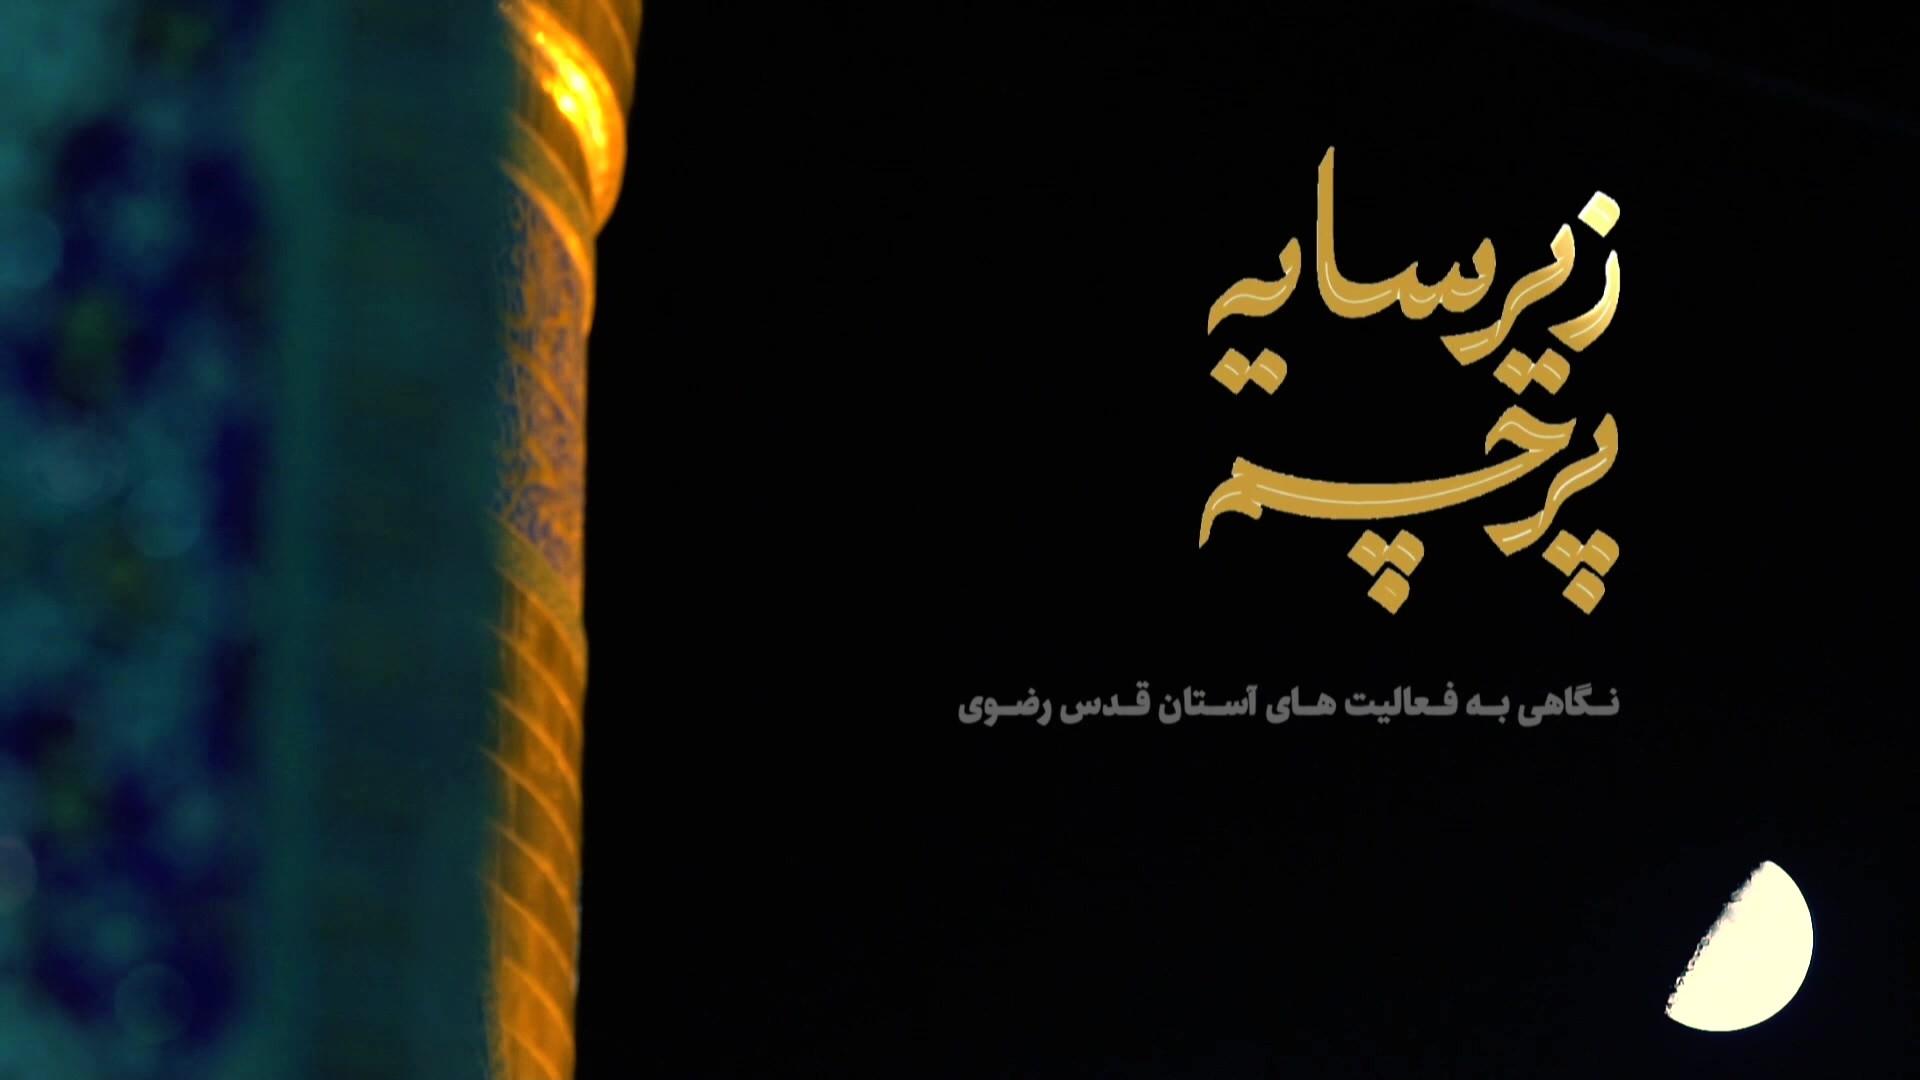 http://zahra-media.ir/wp-content/uploads/2021/06/637508847991054583.jpg